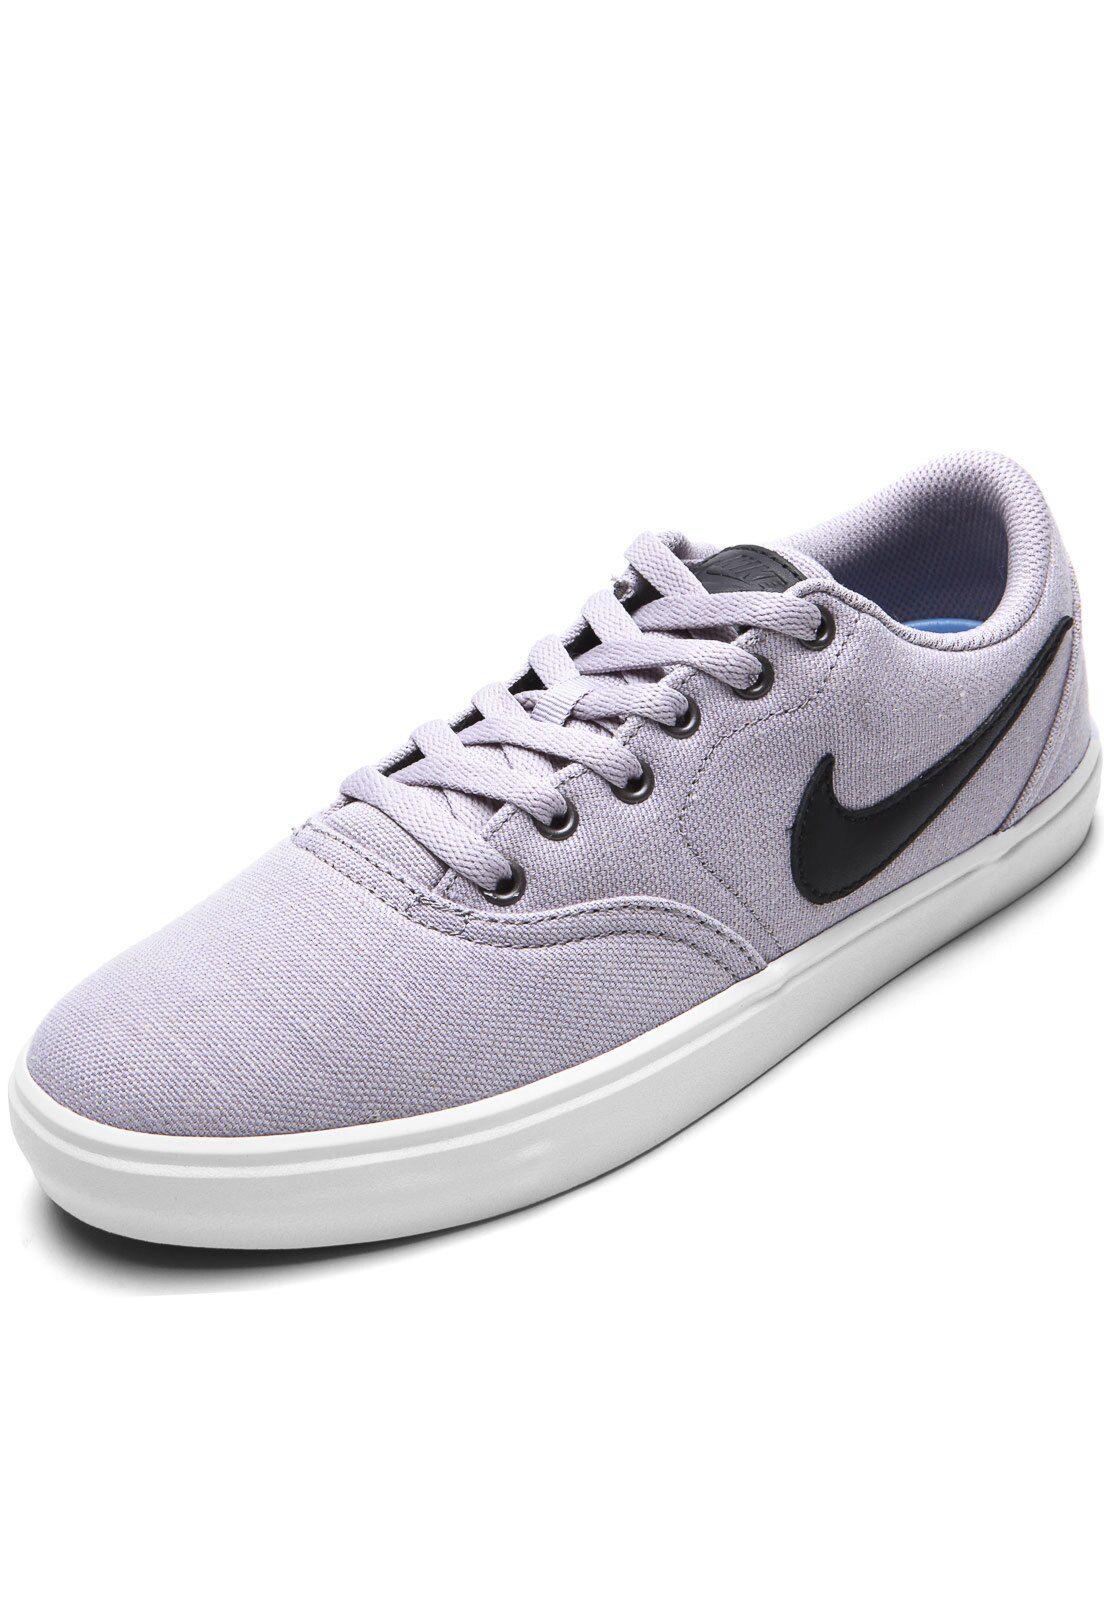 Tenis Nike Sb Sb Check Solar Cnvs Prm Cinza Tenis Nike Sb Nike Sb E Tenis Nike